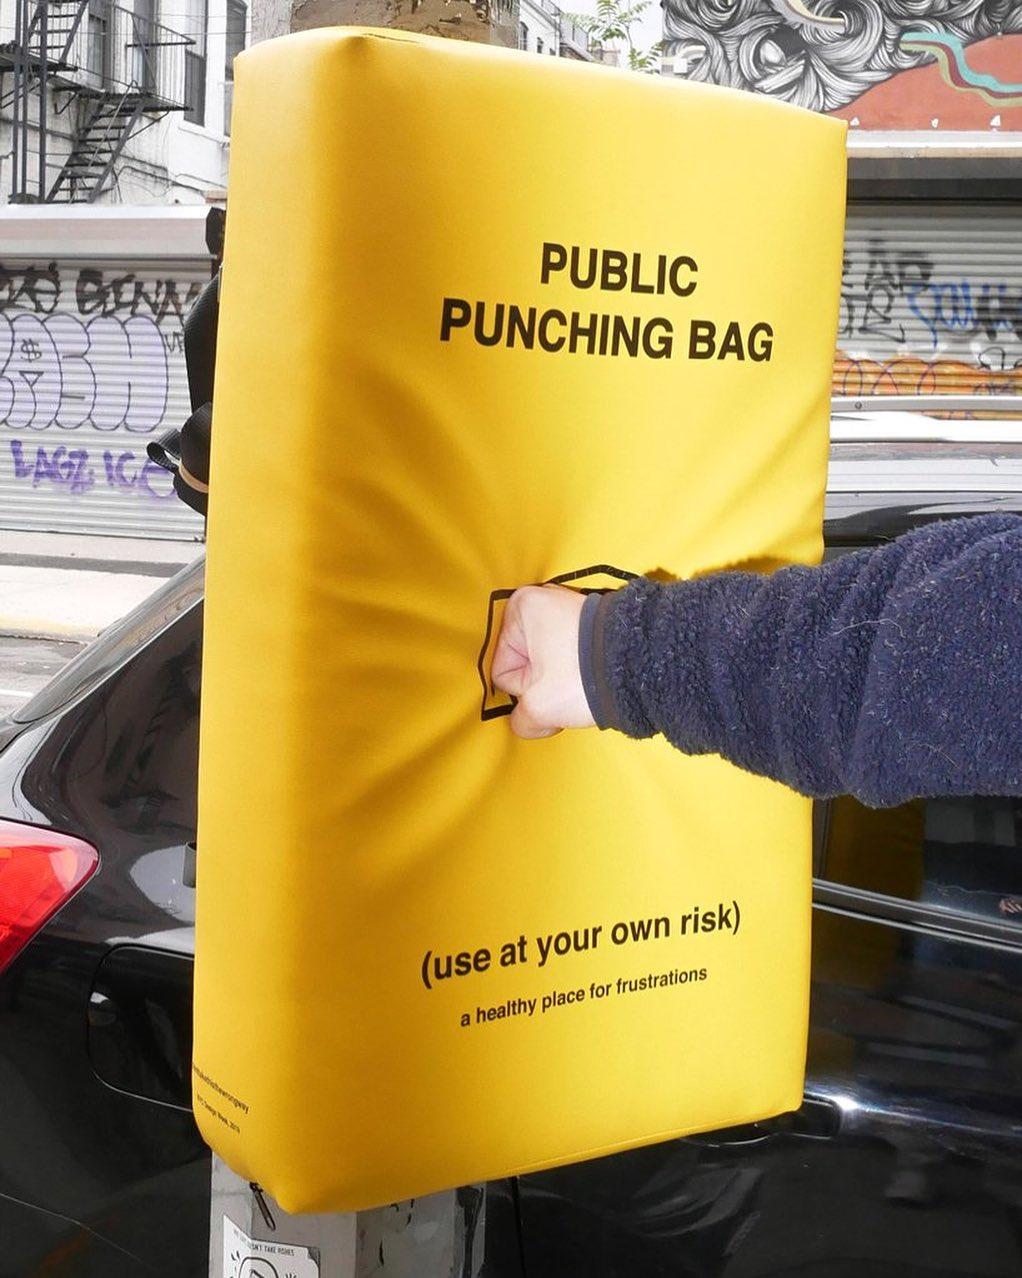 @designboomcn punching bag in lower manhattan